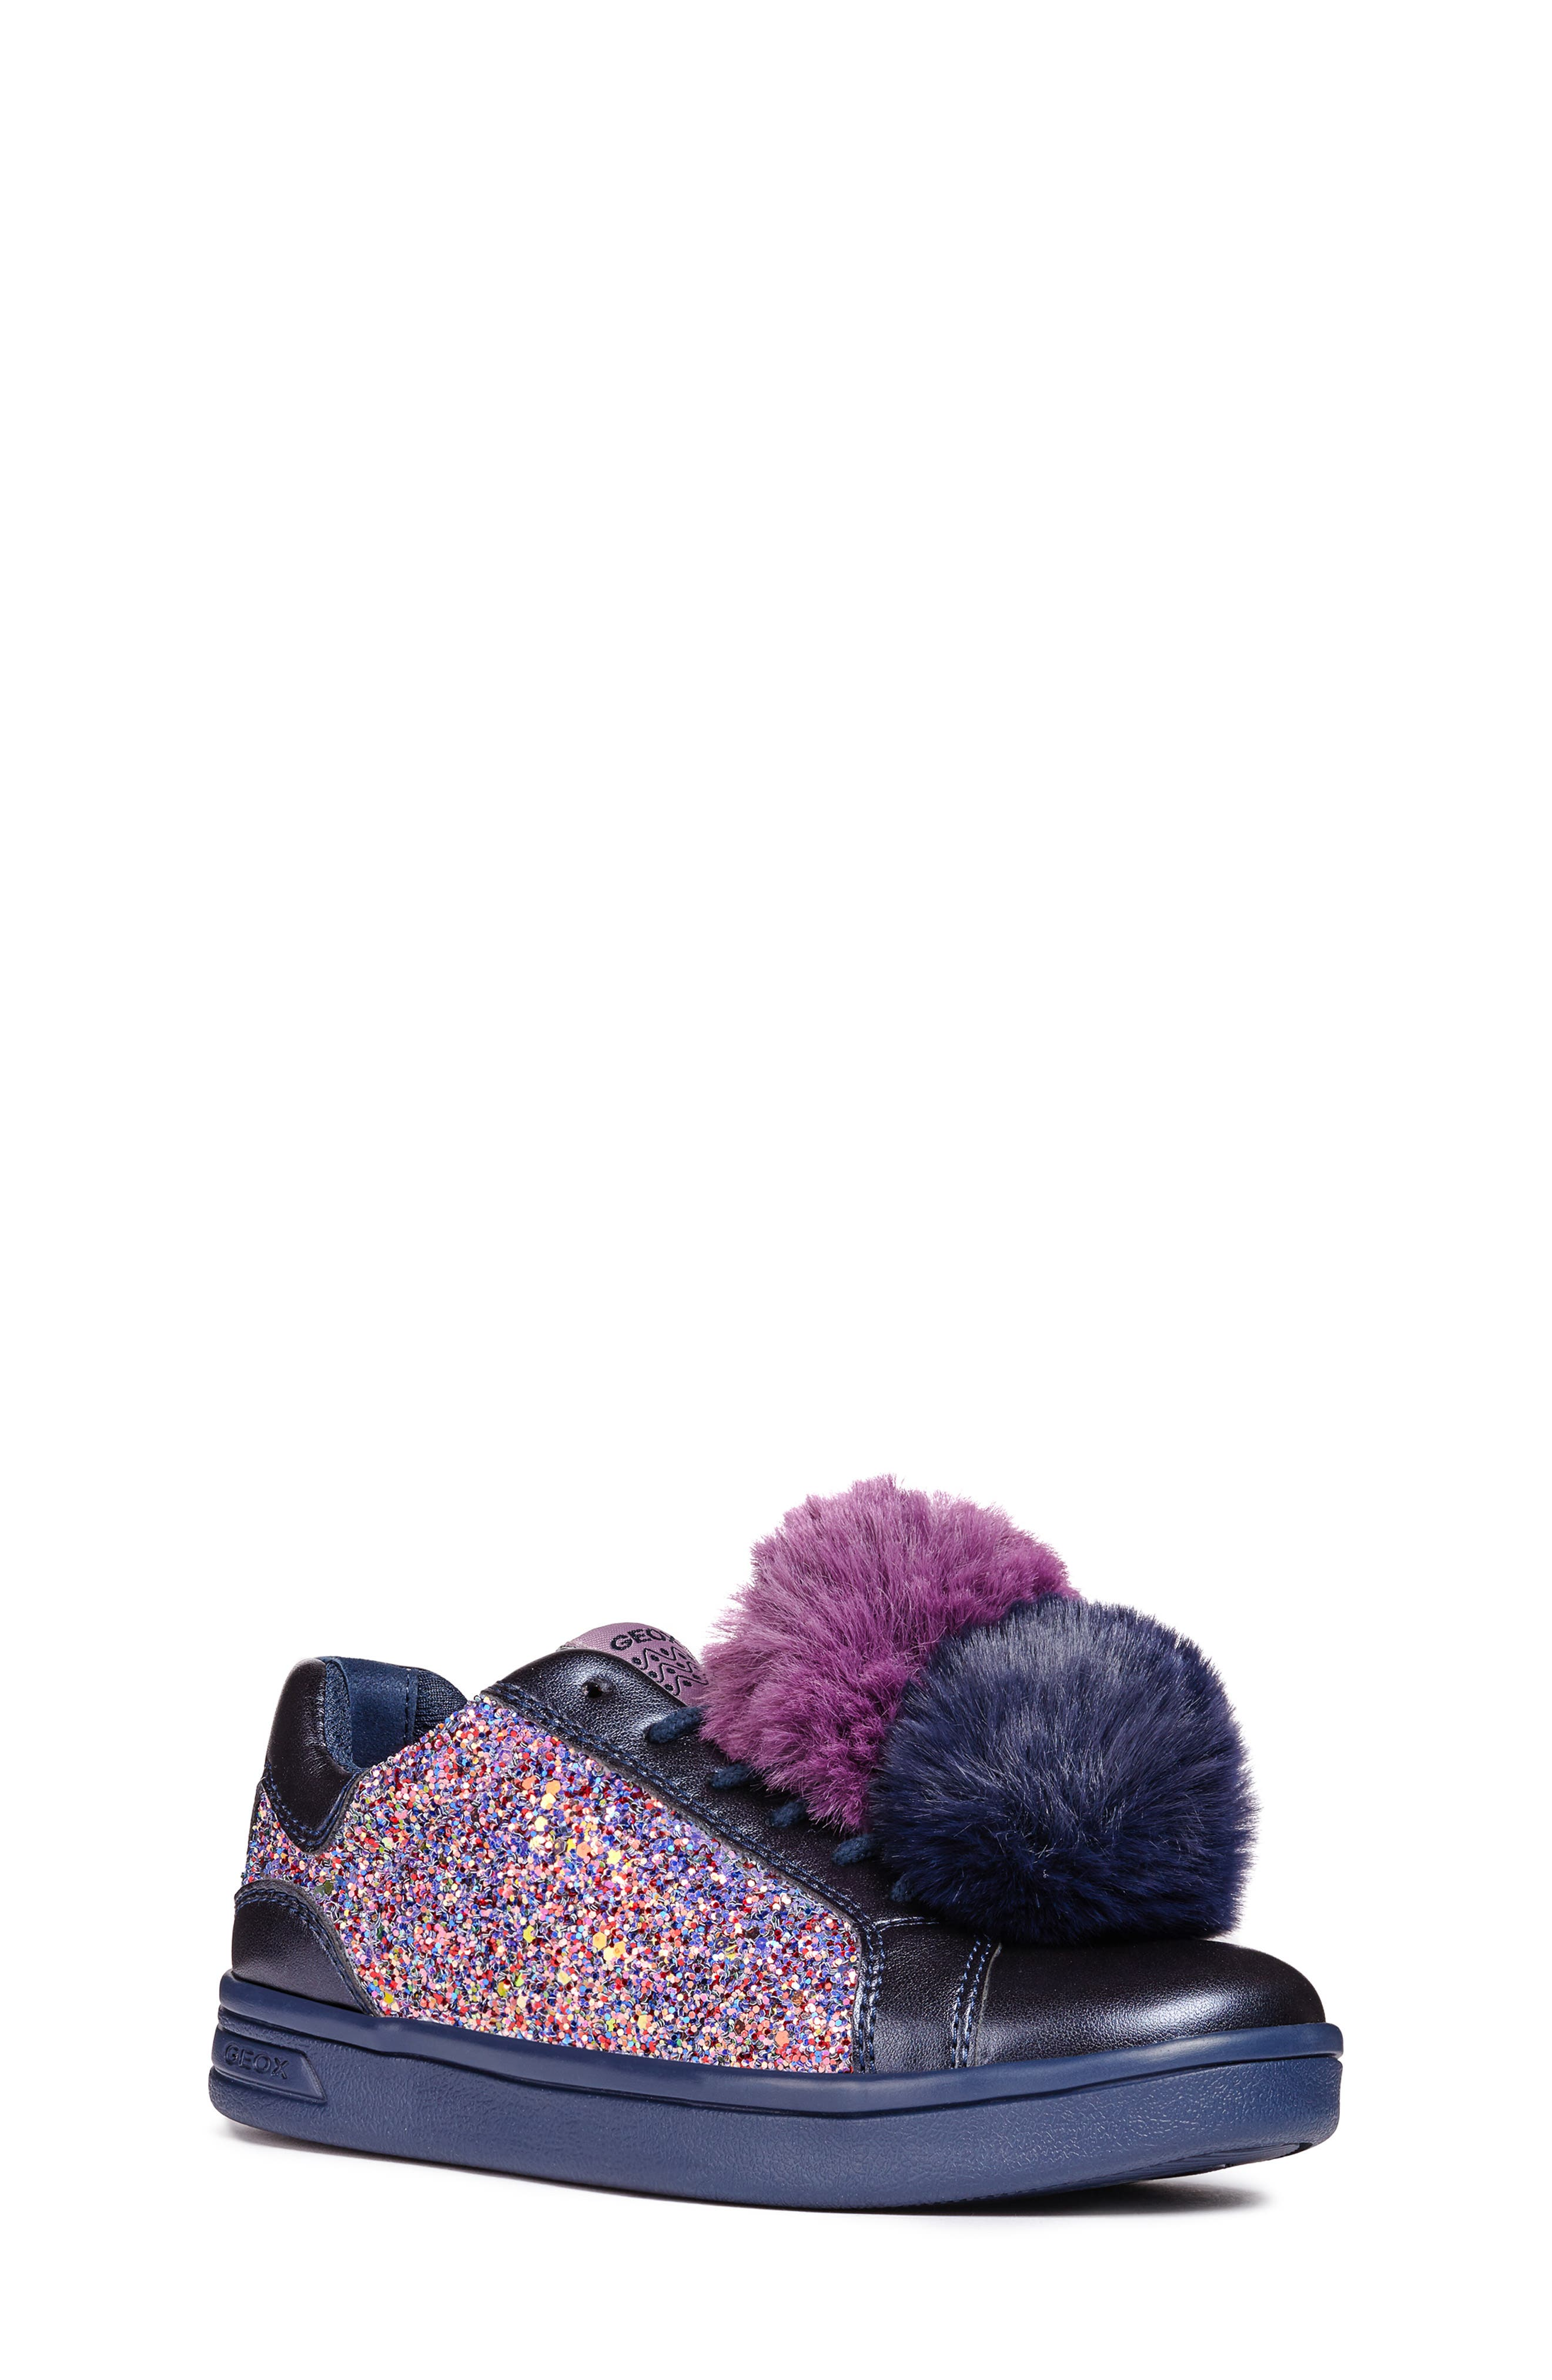 DJ Rock Glitter Pompom Sneaker,                         Main,                         color, NAVY/LT PRUNE